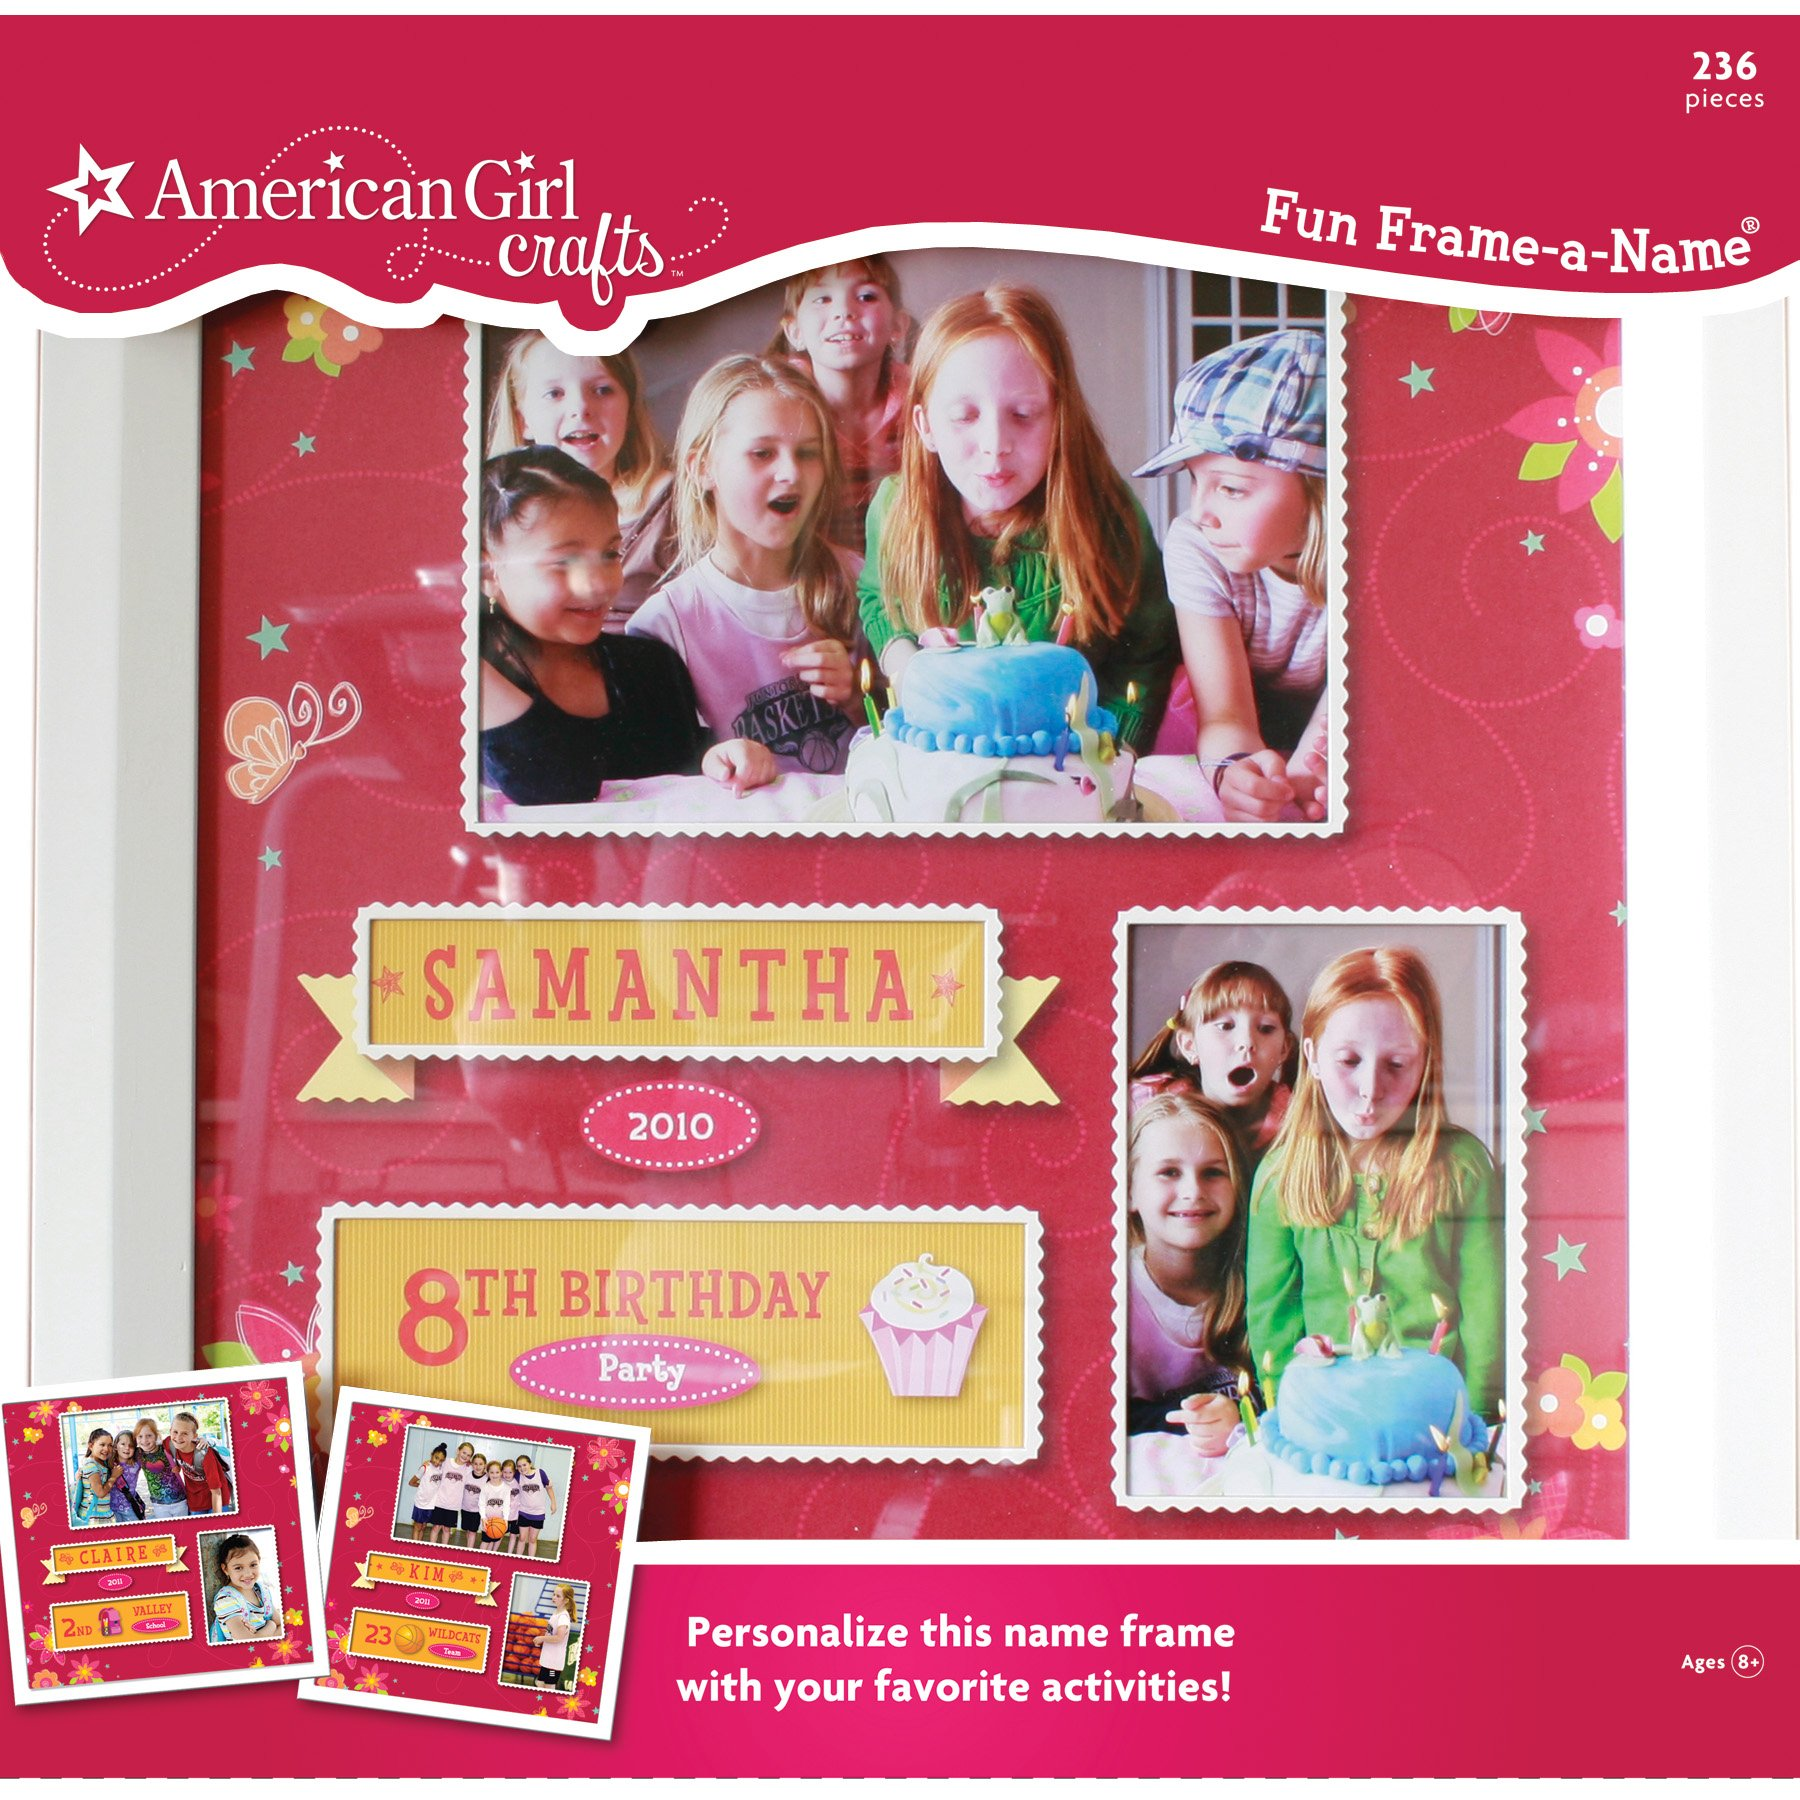 American Girl Crafts Fun Frame-A-Name